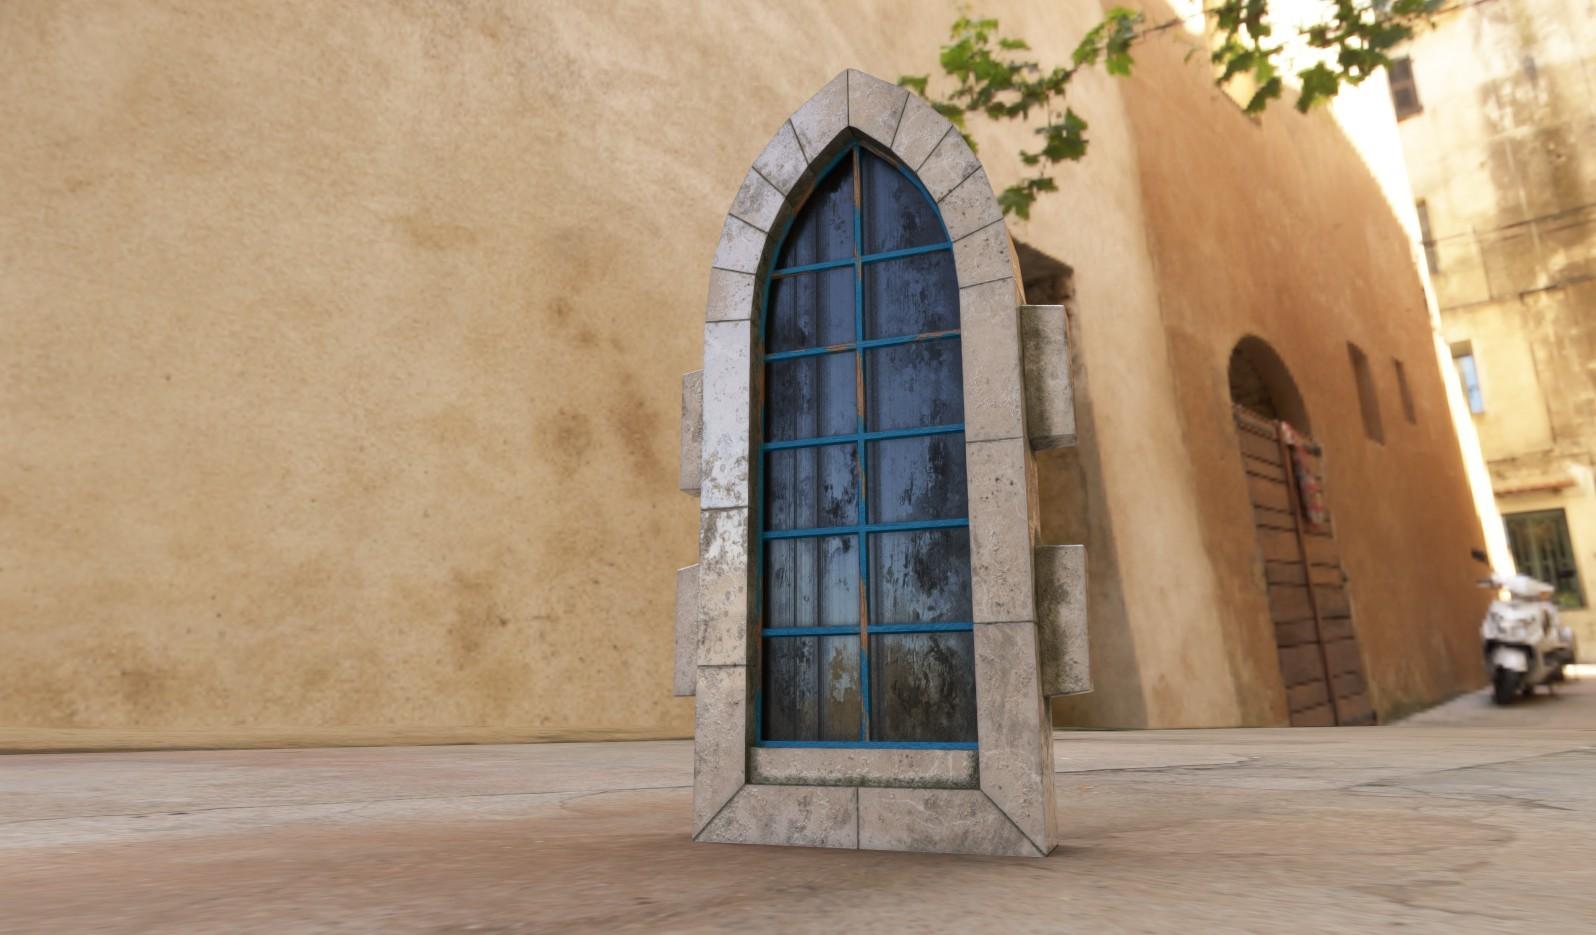 Modular Windows for Medieval game level